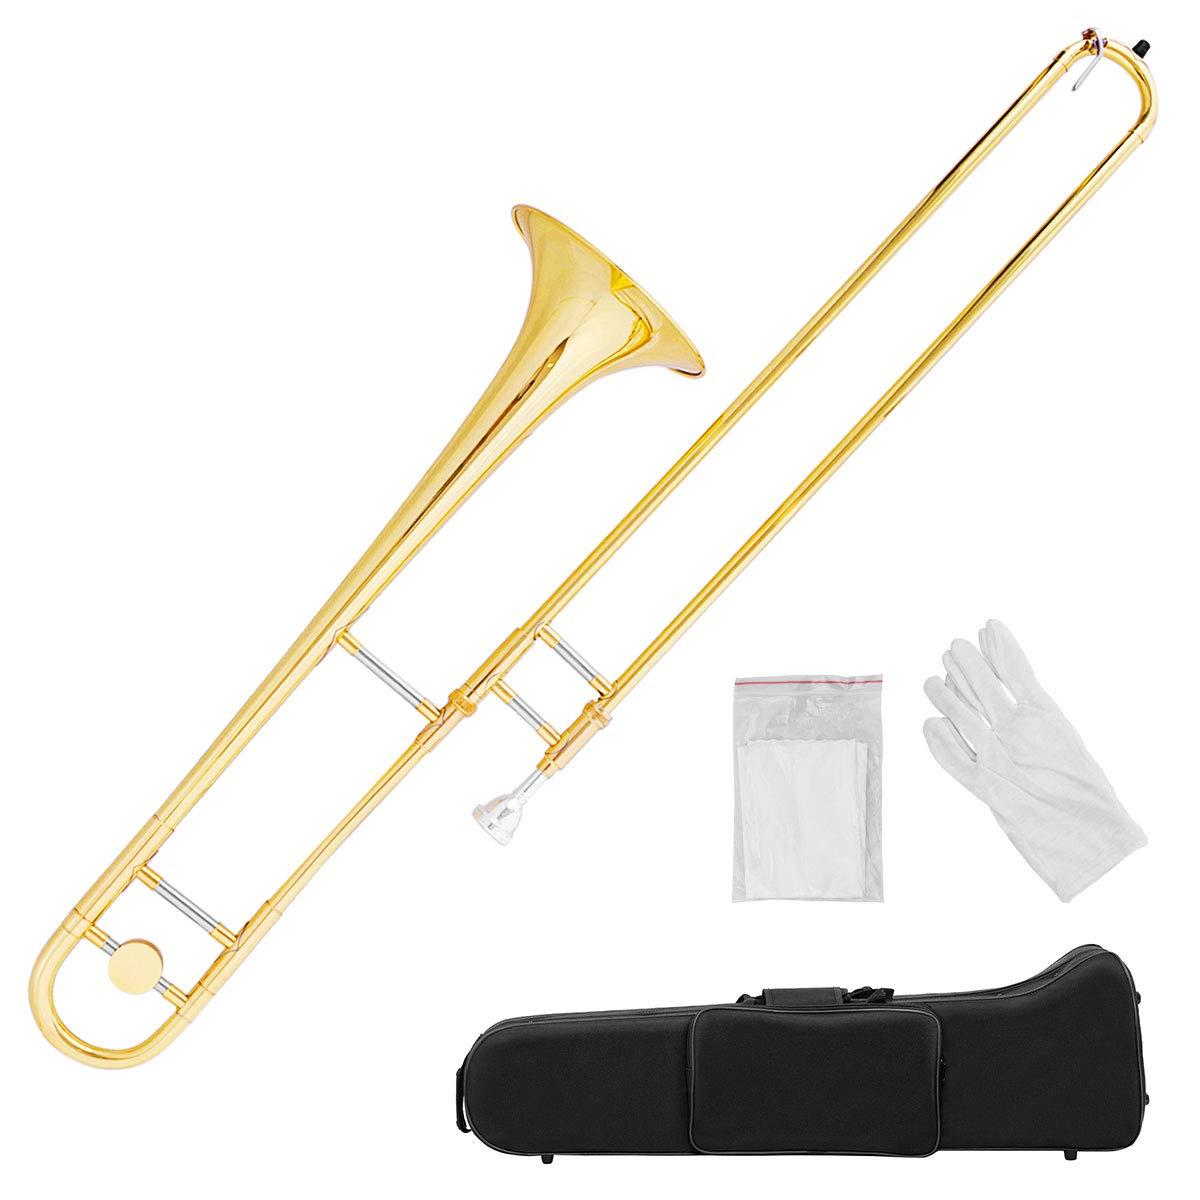 Costzon B Flat Tenor Slide Trombone Gold Brass, Sound for Standard Student Beginner Trombone w/Case, Gloves, Mouthpiece, Portable by Costzon